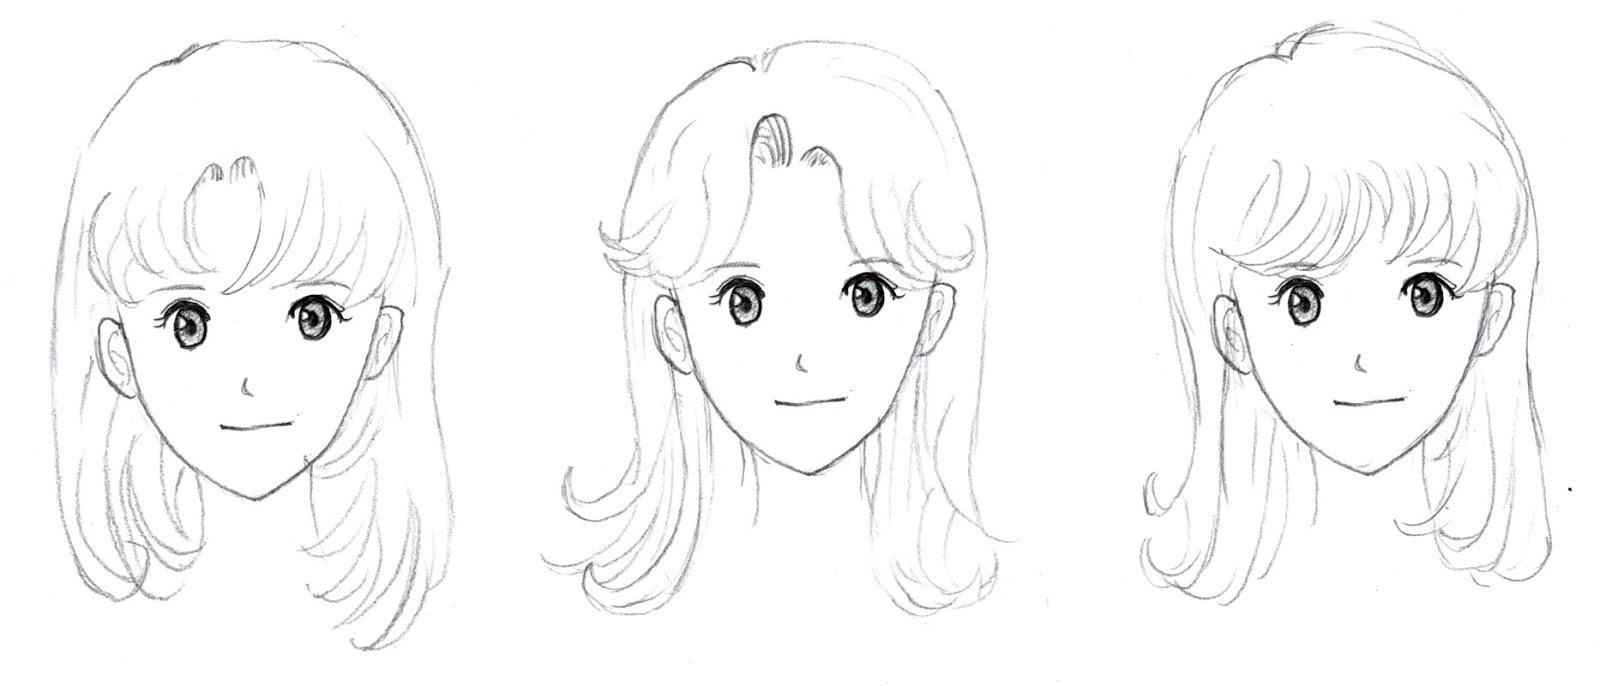 Johnnybros how to draw manga how to draw manga hair part 1 the basics